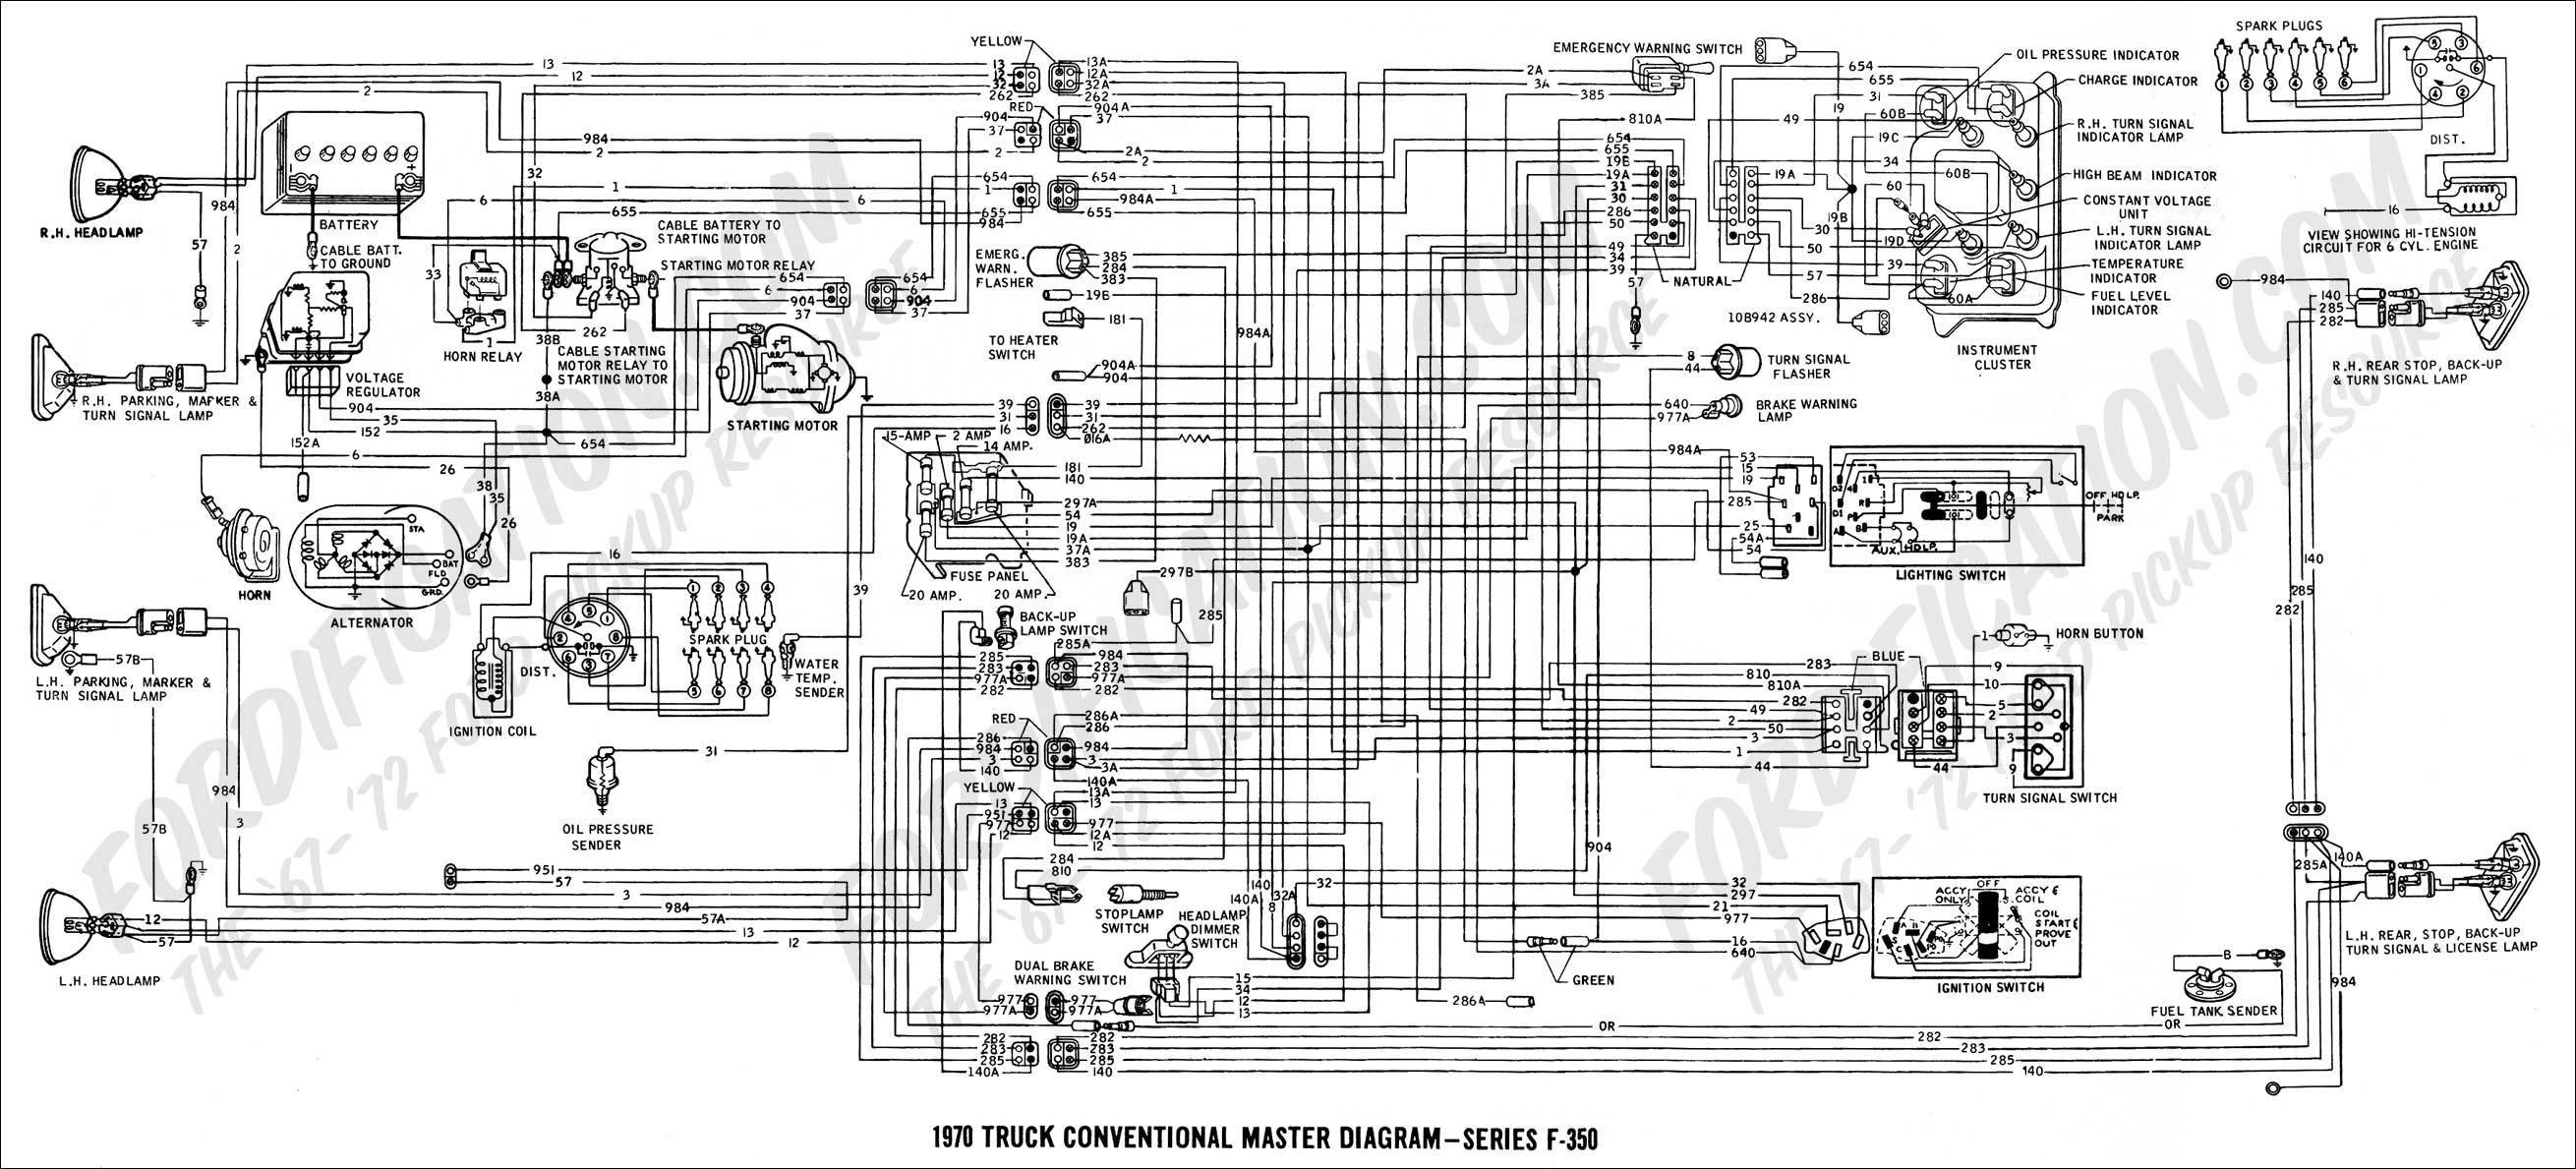 Car Electrical Wiring Kenworth Truck Light Wiring Diagram Schematics Car Electrica Kenworth Truck Light Wiring Diagram